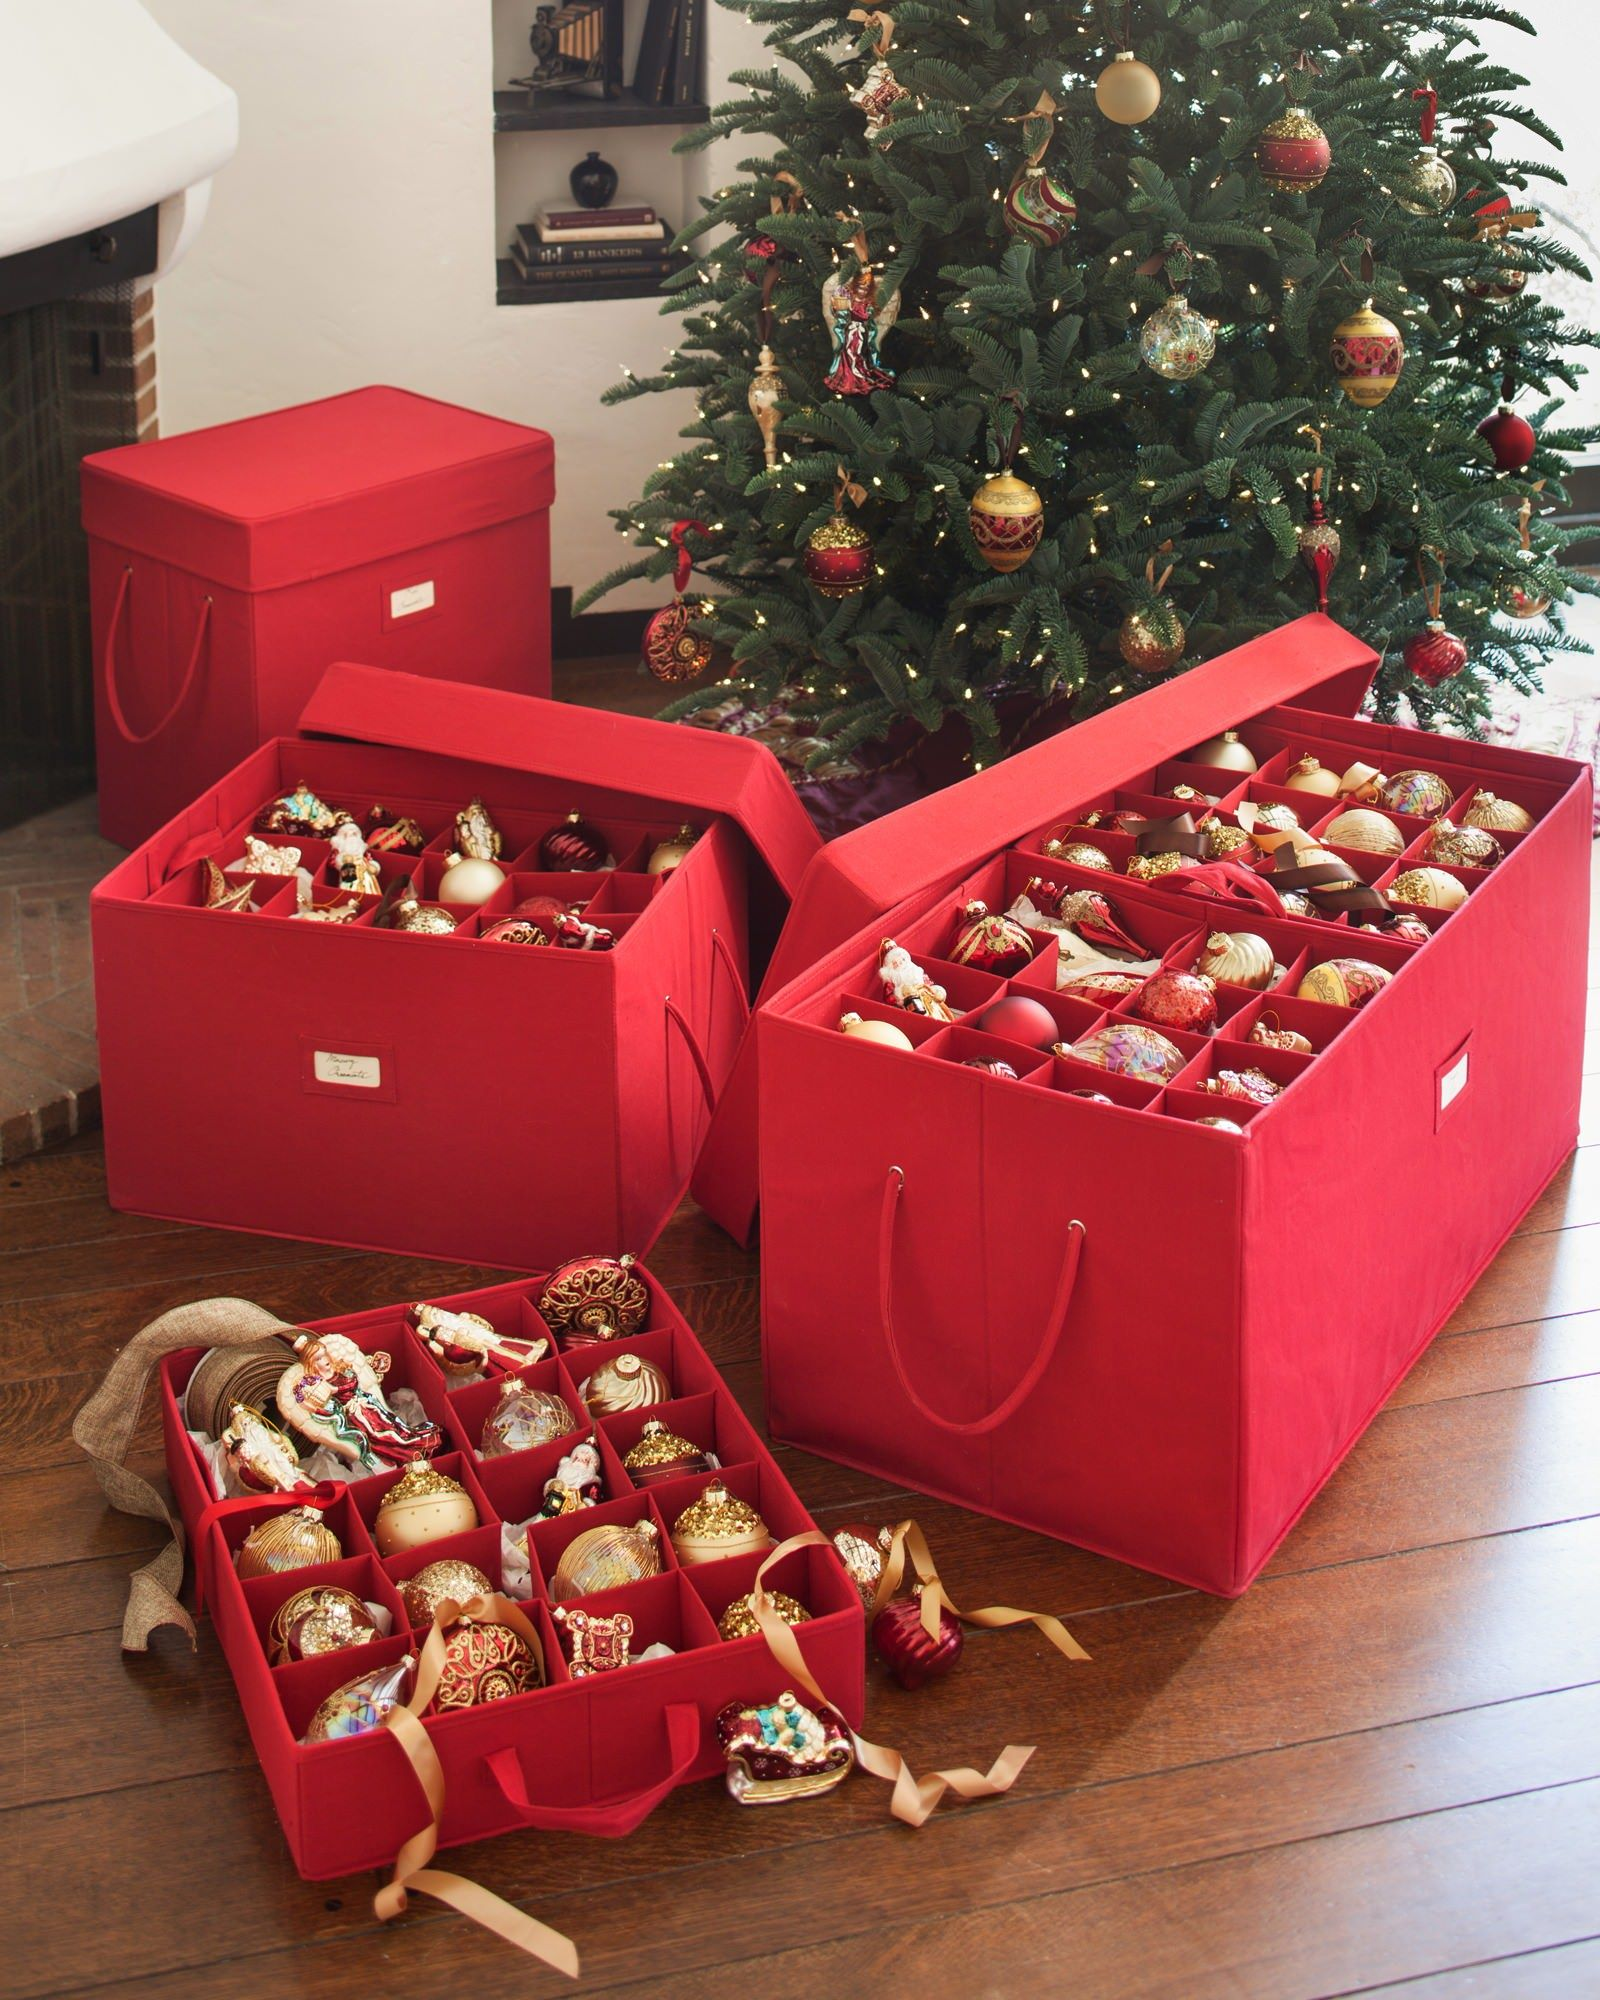 Christmas Ornament Storage Box Christmas Ornament Storage Christmas Ornament Storage Box Christmas Tree Storage